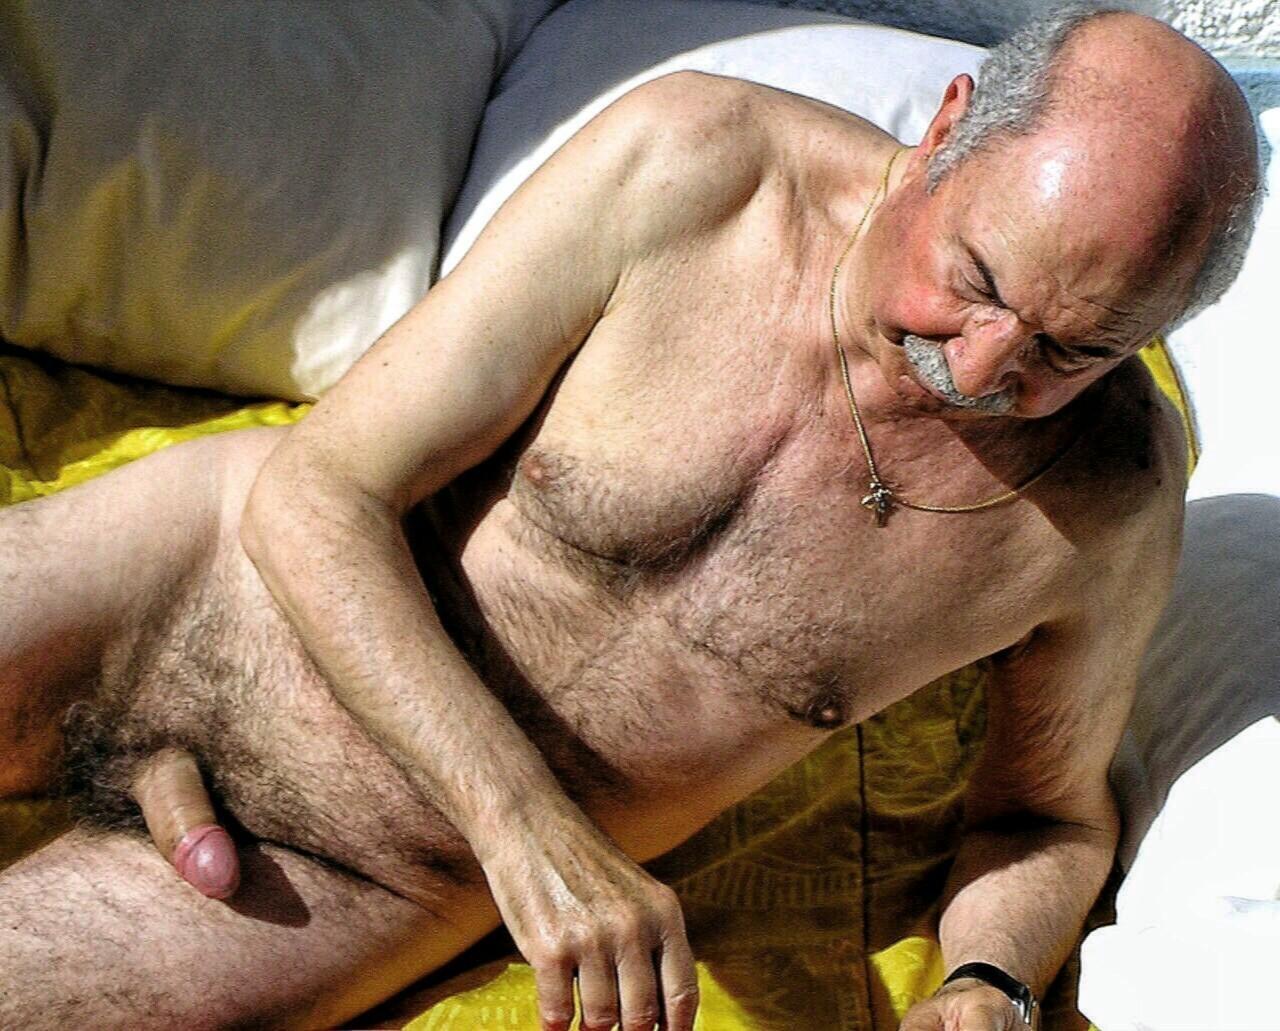 Grandpa gay porn category